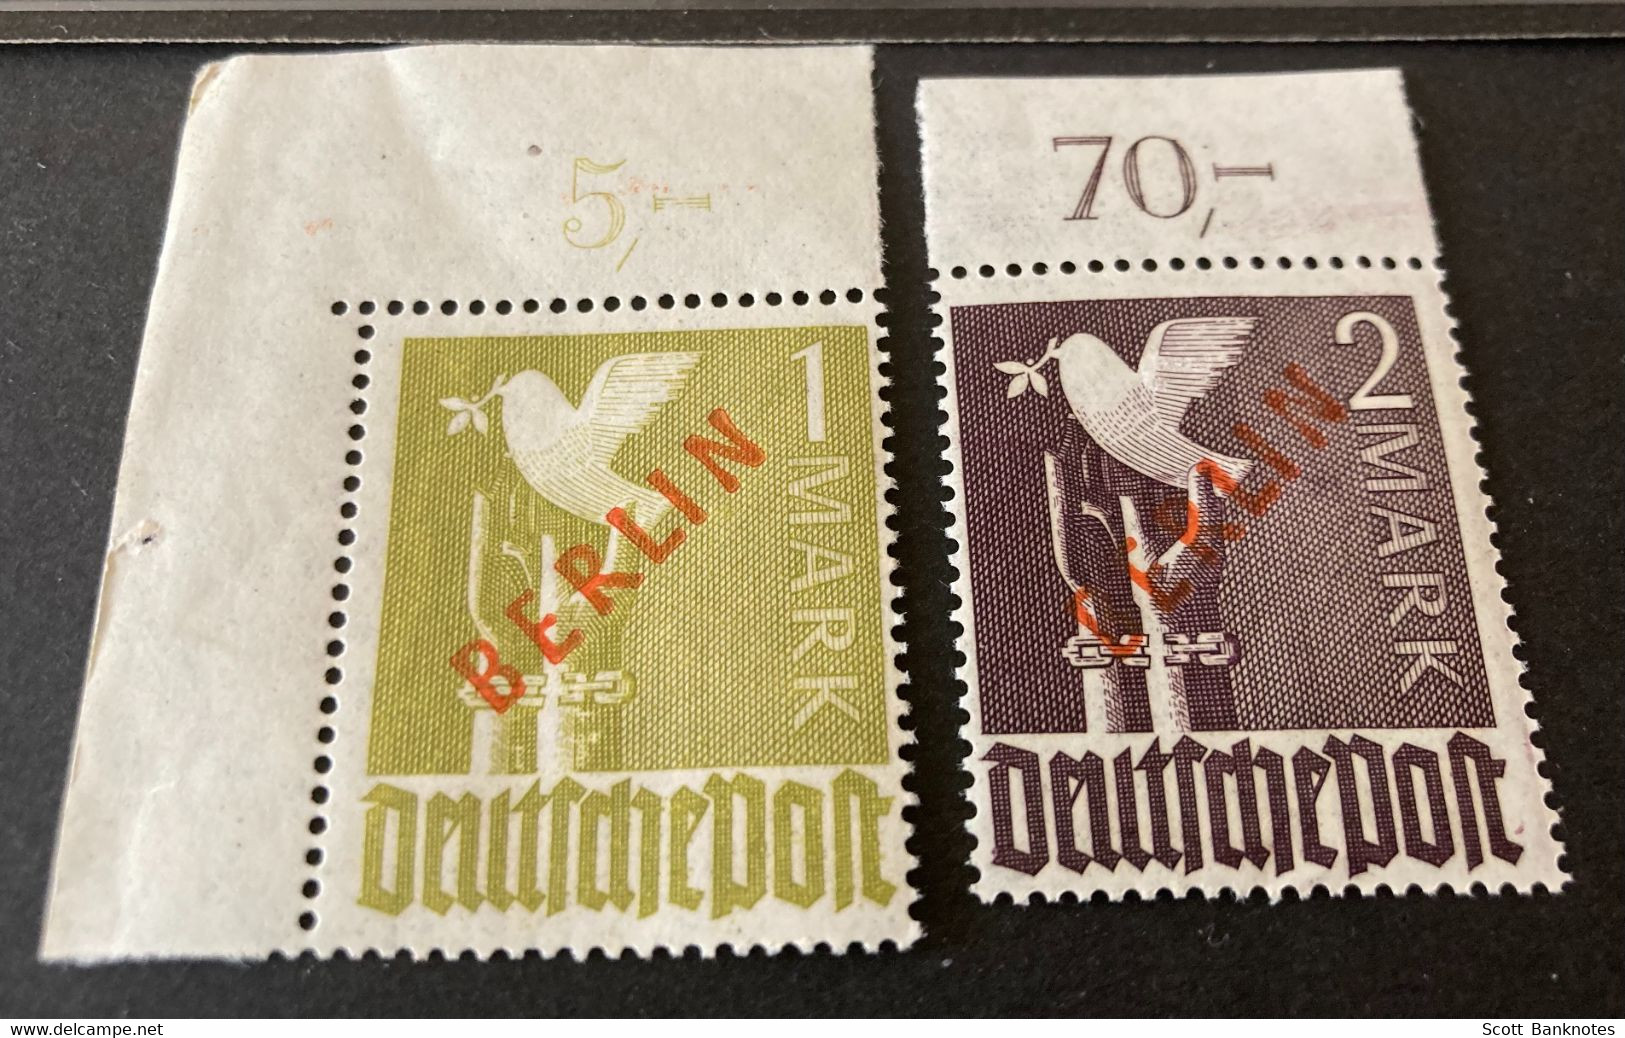 BERLIN 1949 Unused Stamps Extra Paper - Unused Stamps